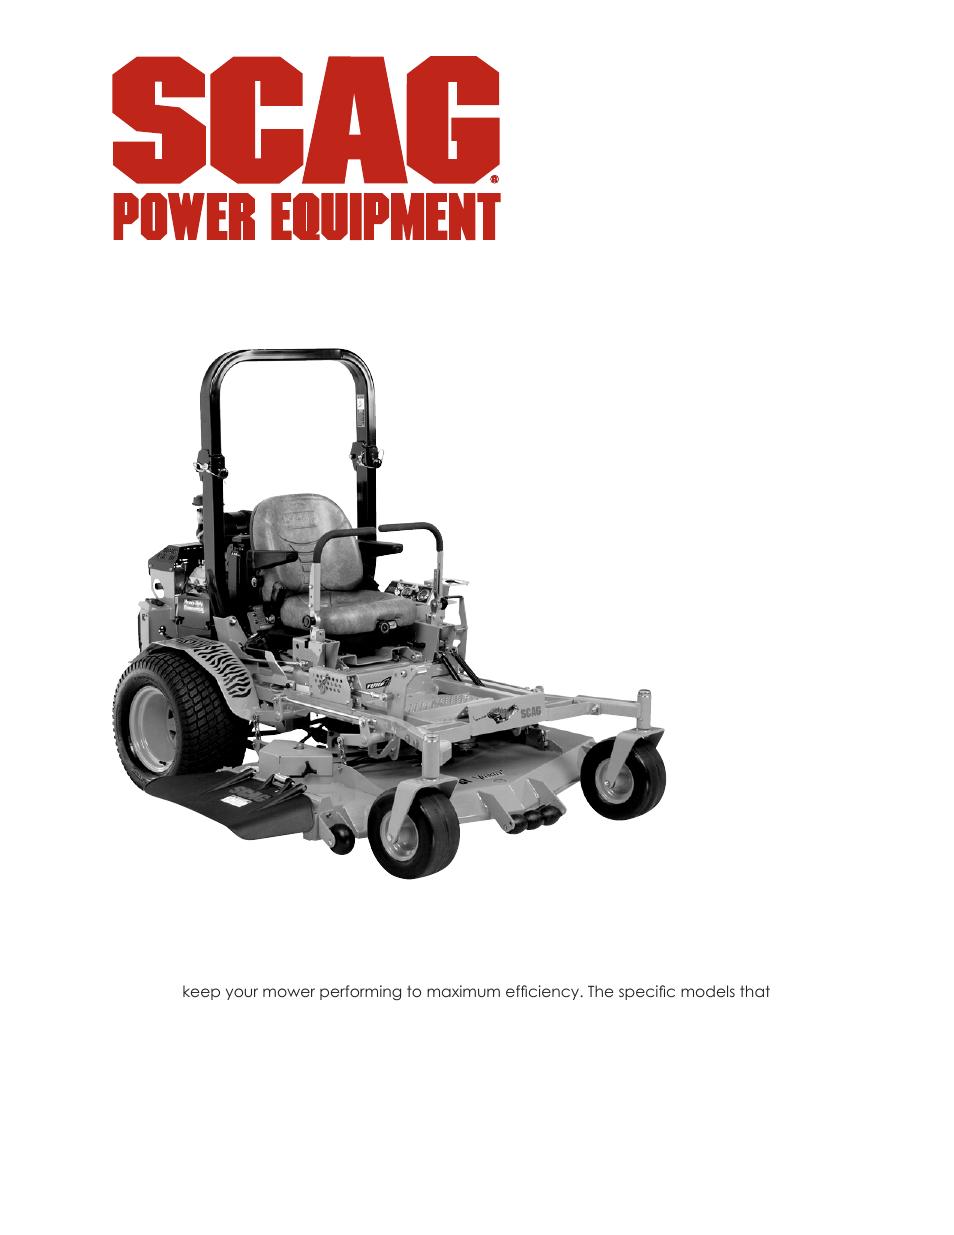 scag power equipment stt61v 29dfi ss user manual 143 pages also rh manualsdir com Owner Manual Ssz-18Cv-48 Scag Turf Tiger scag turf tiger repair manual